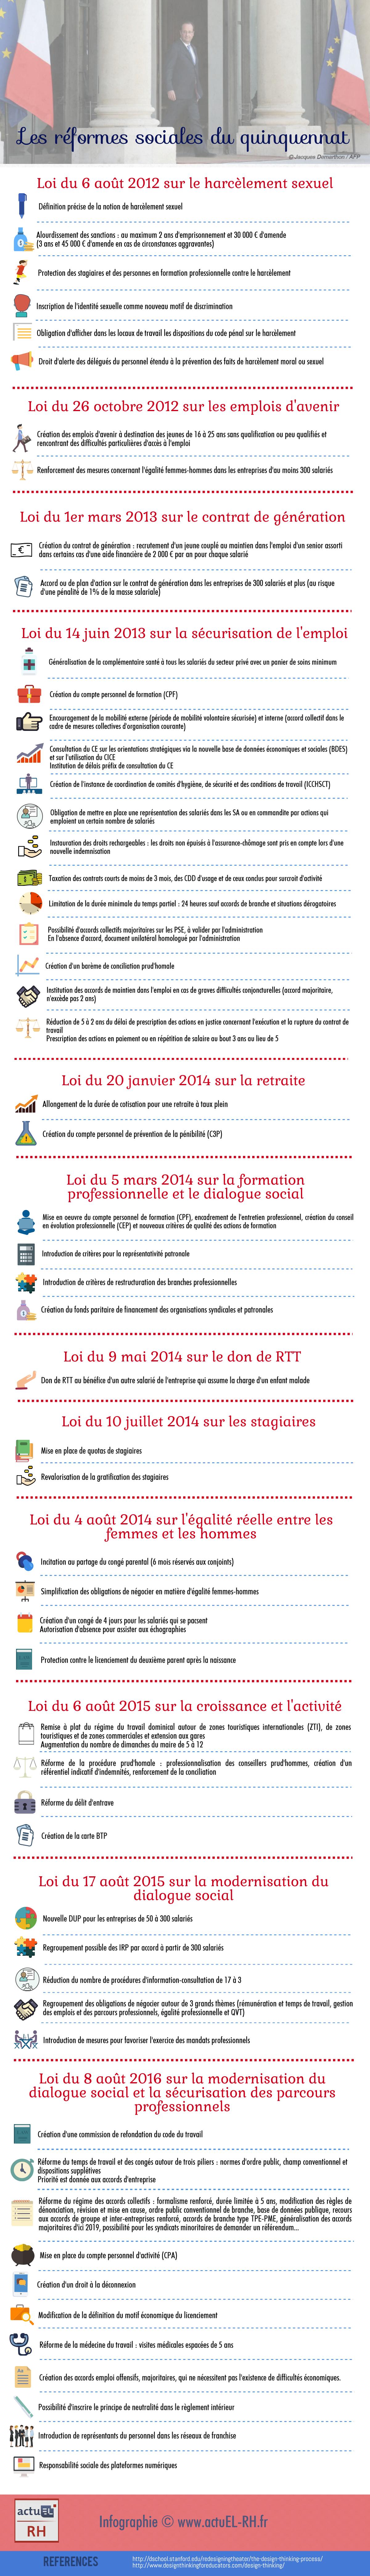 infographie-reformes-sociales-quinquennat3